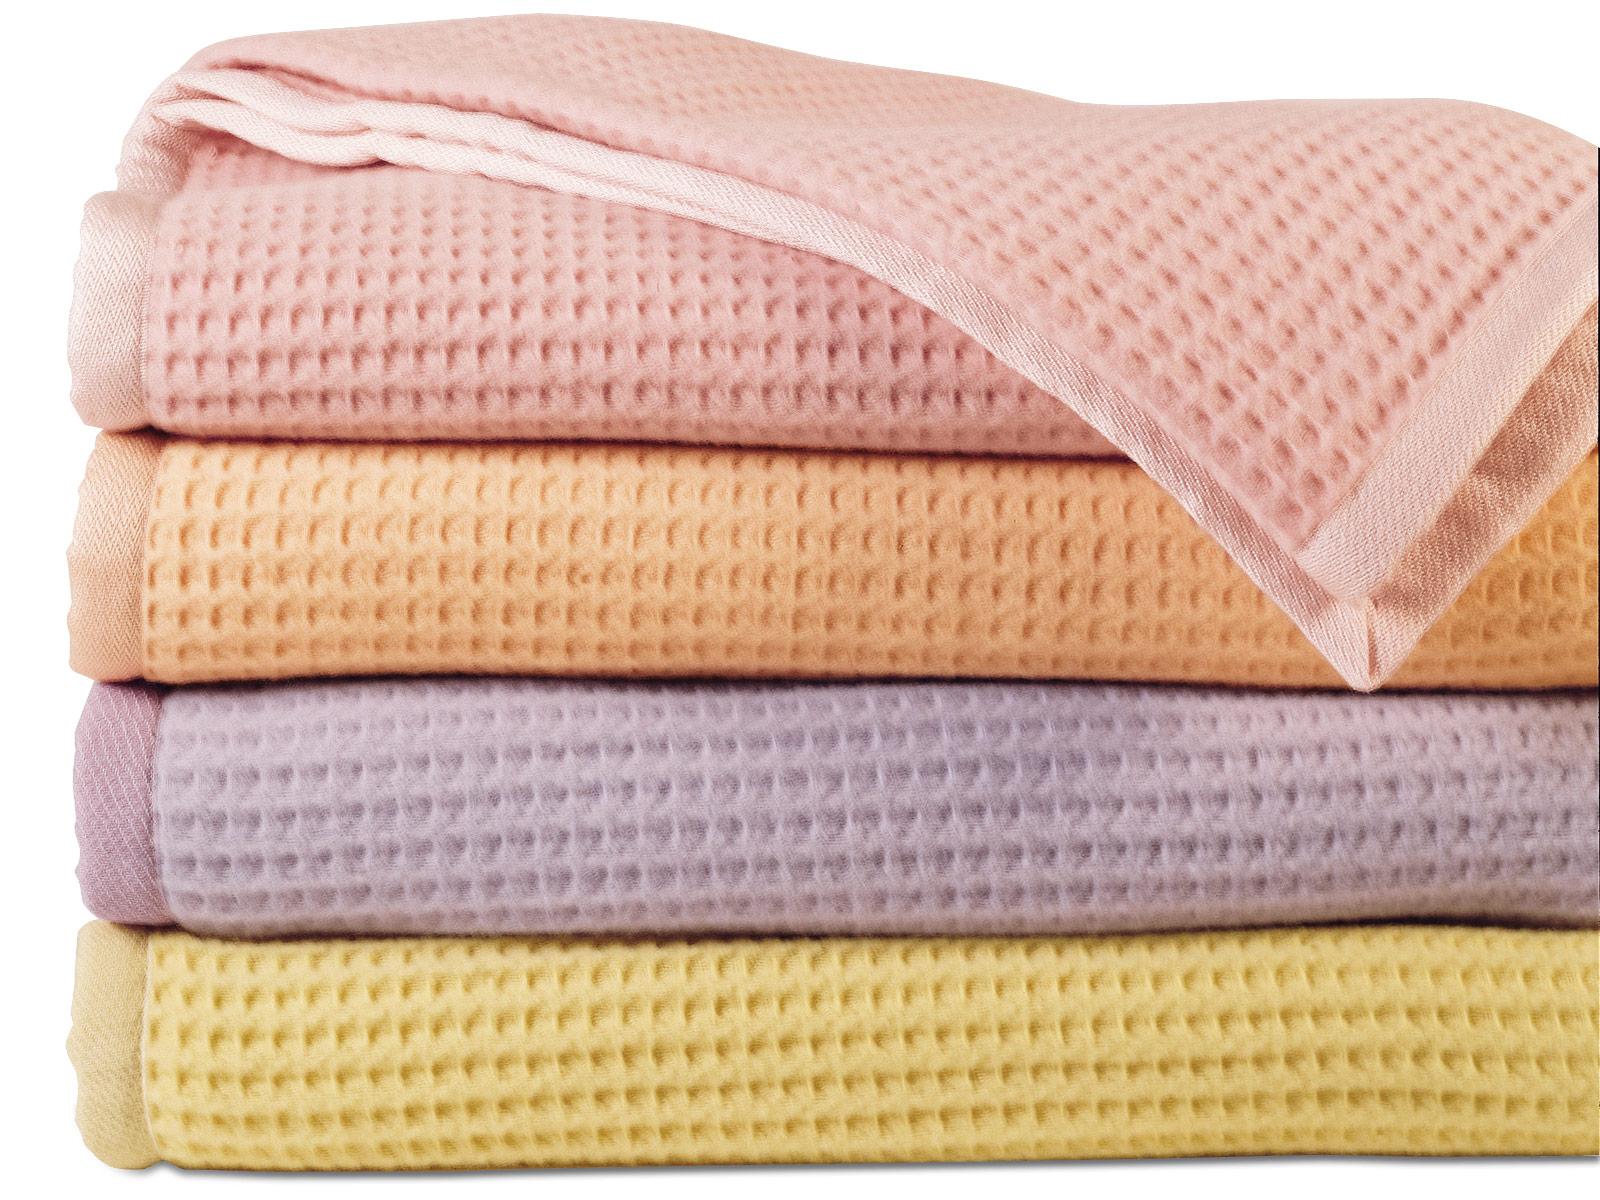 Windham Blankets Luxury Blankets Luxury Bedding